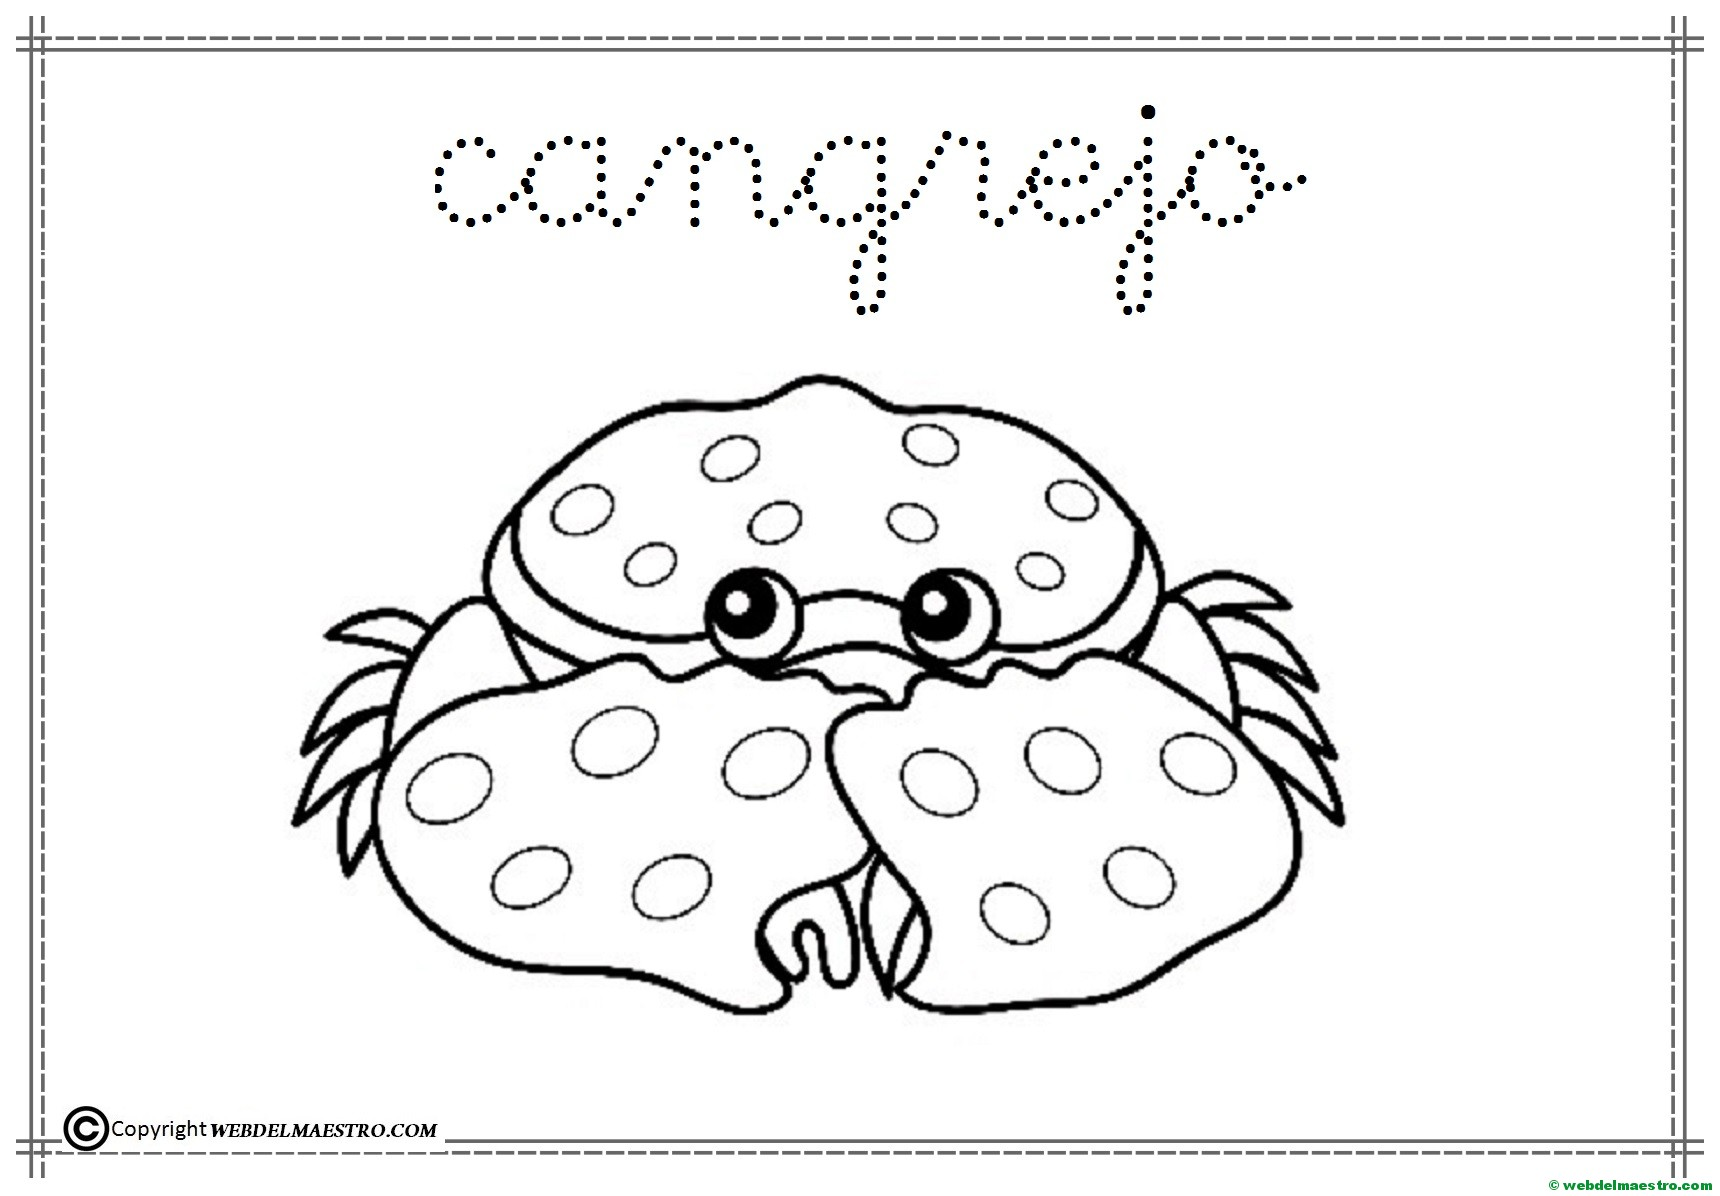 2-cangrejo - Web del maestro